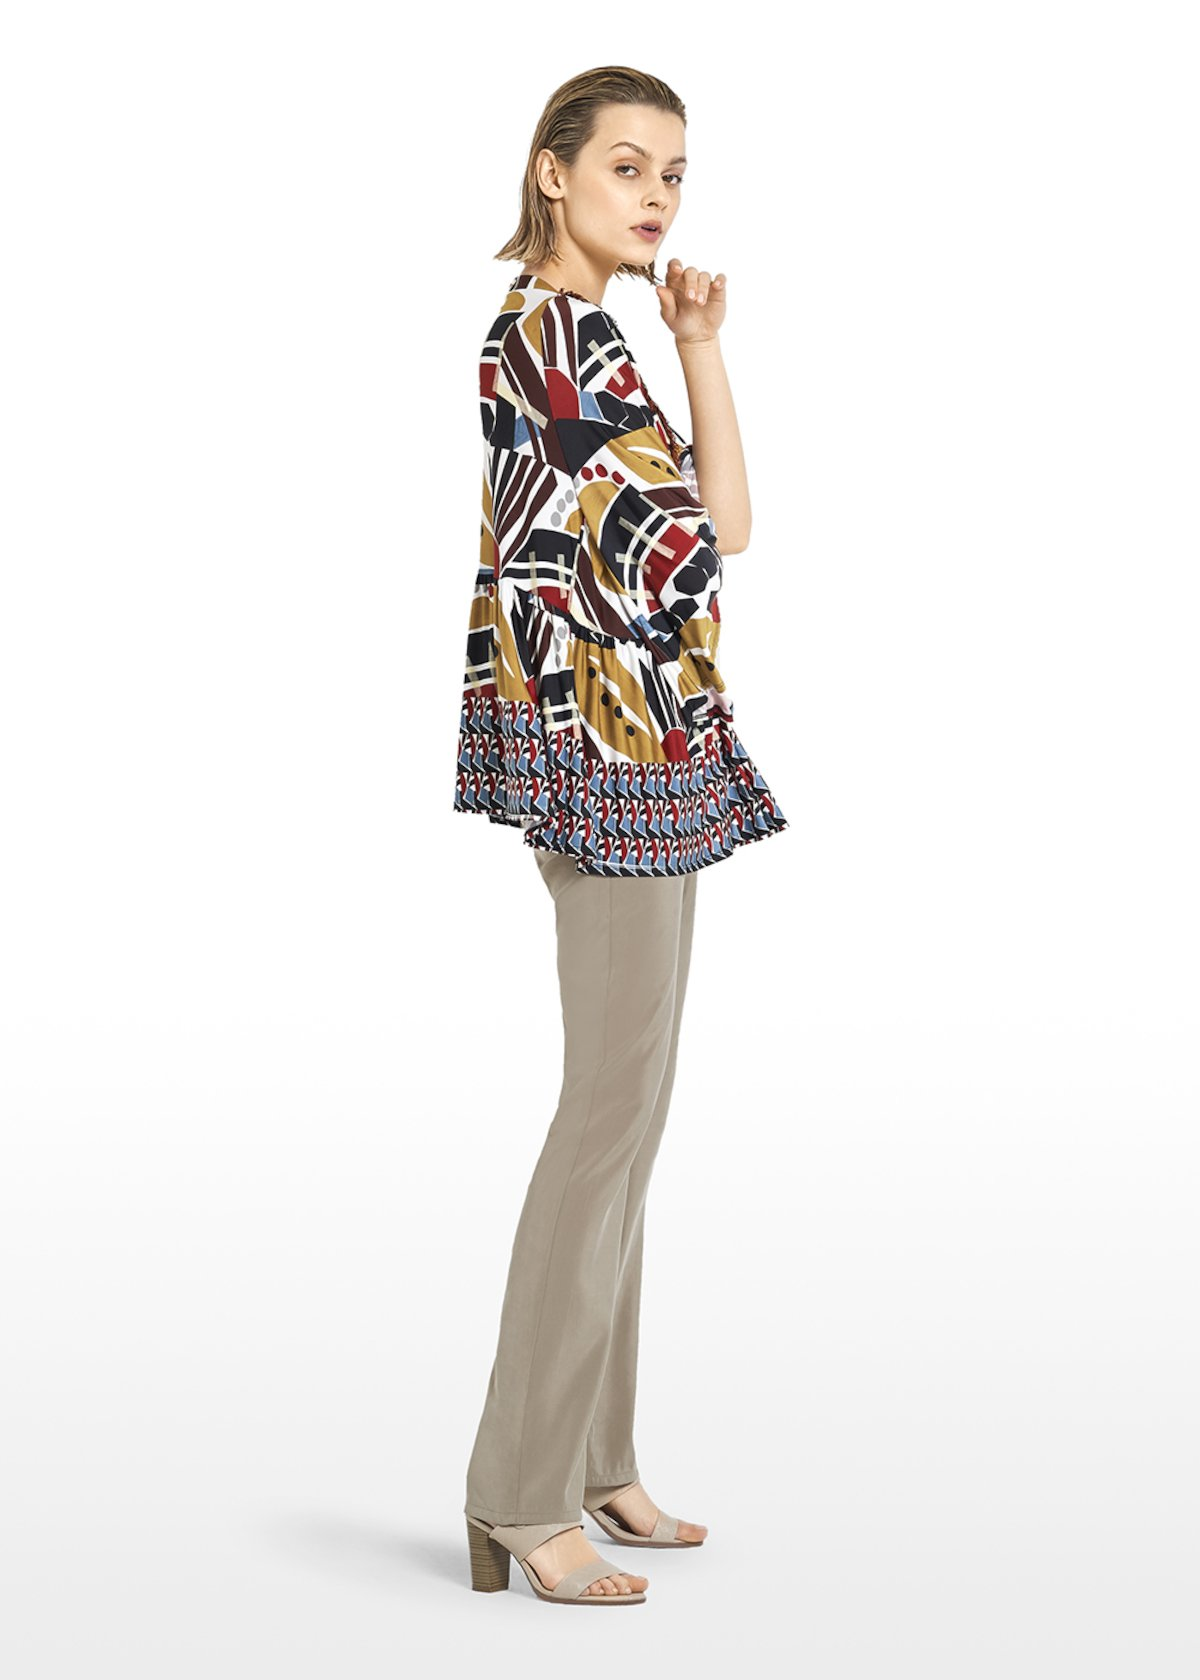 T-shirt Sissie ethno pattern with V-neck - Kiwi / Black Fantasia - Woman - Category image